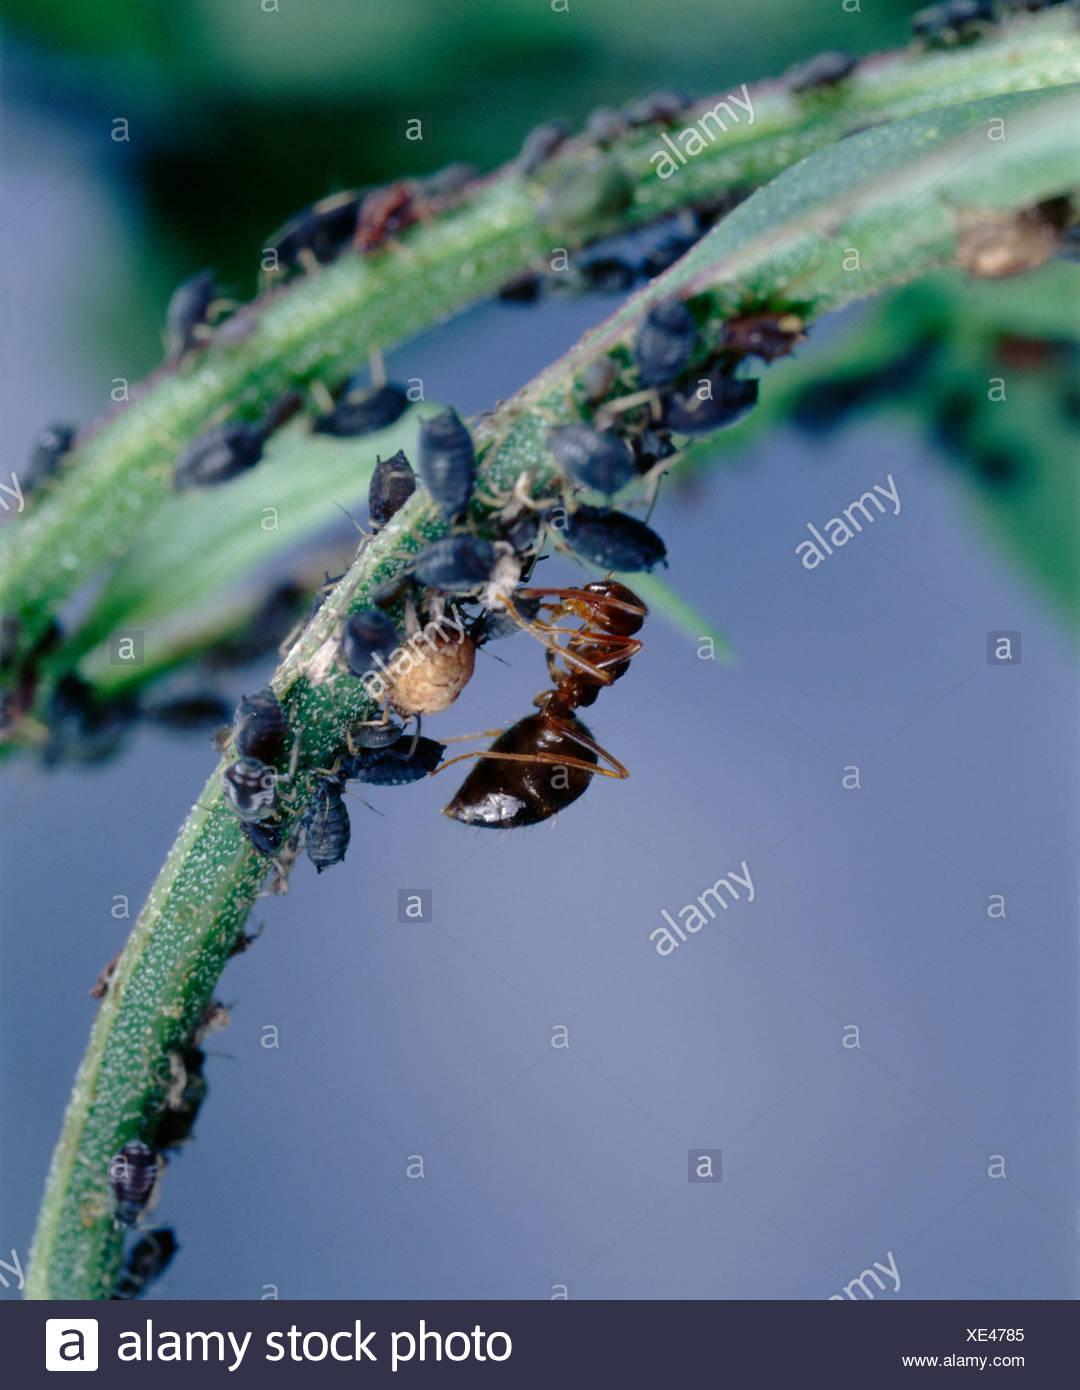 Sugar Ant Stock Photos & Sugar Ant Stock Images - Alamy